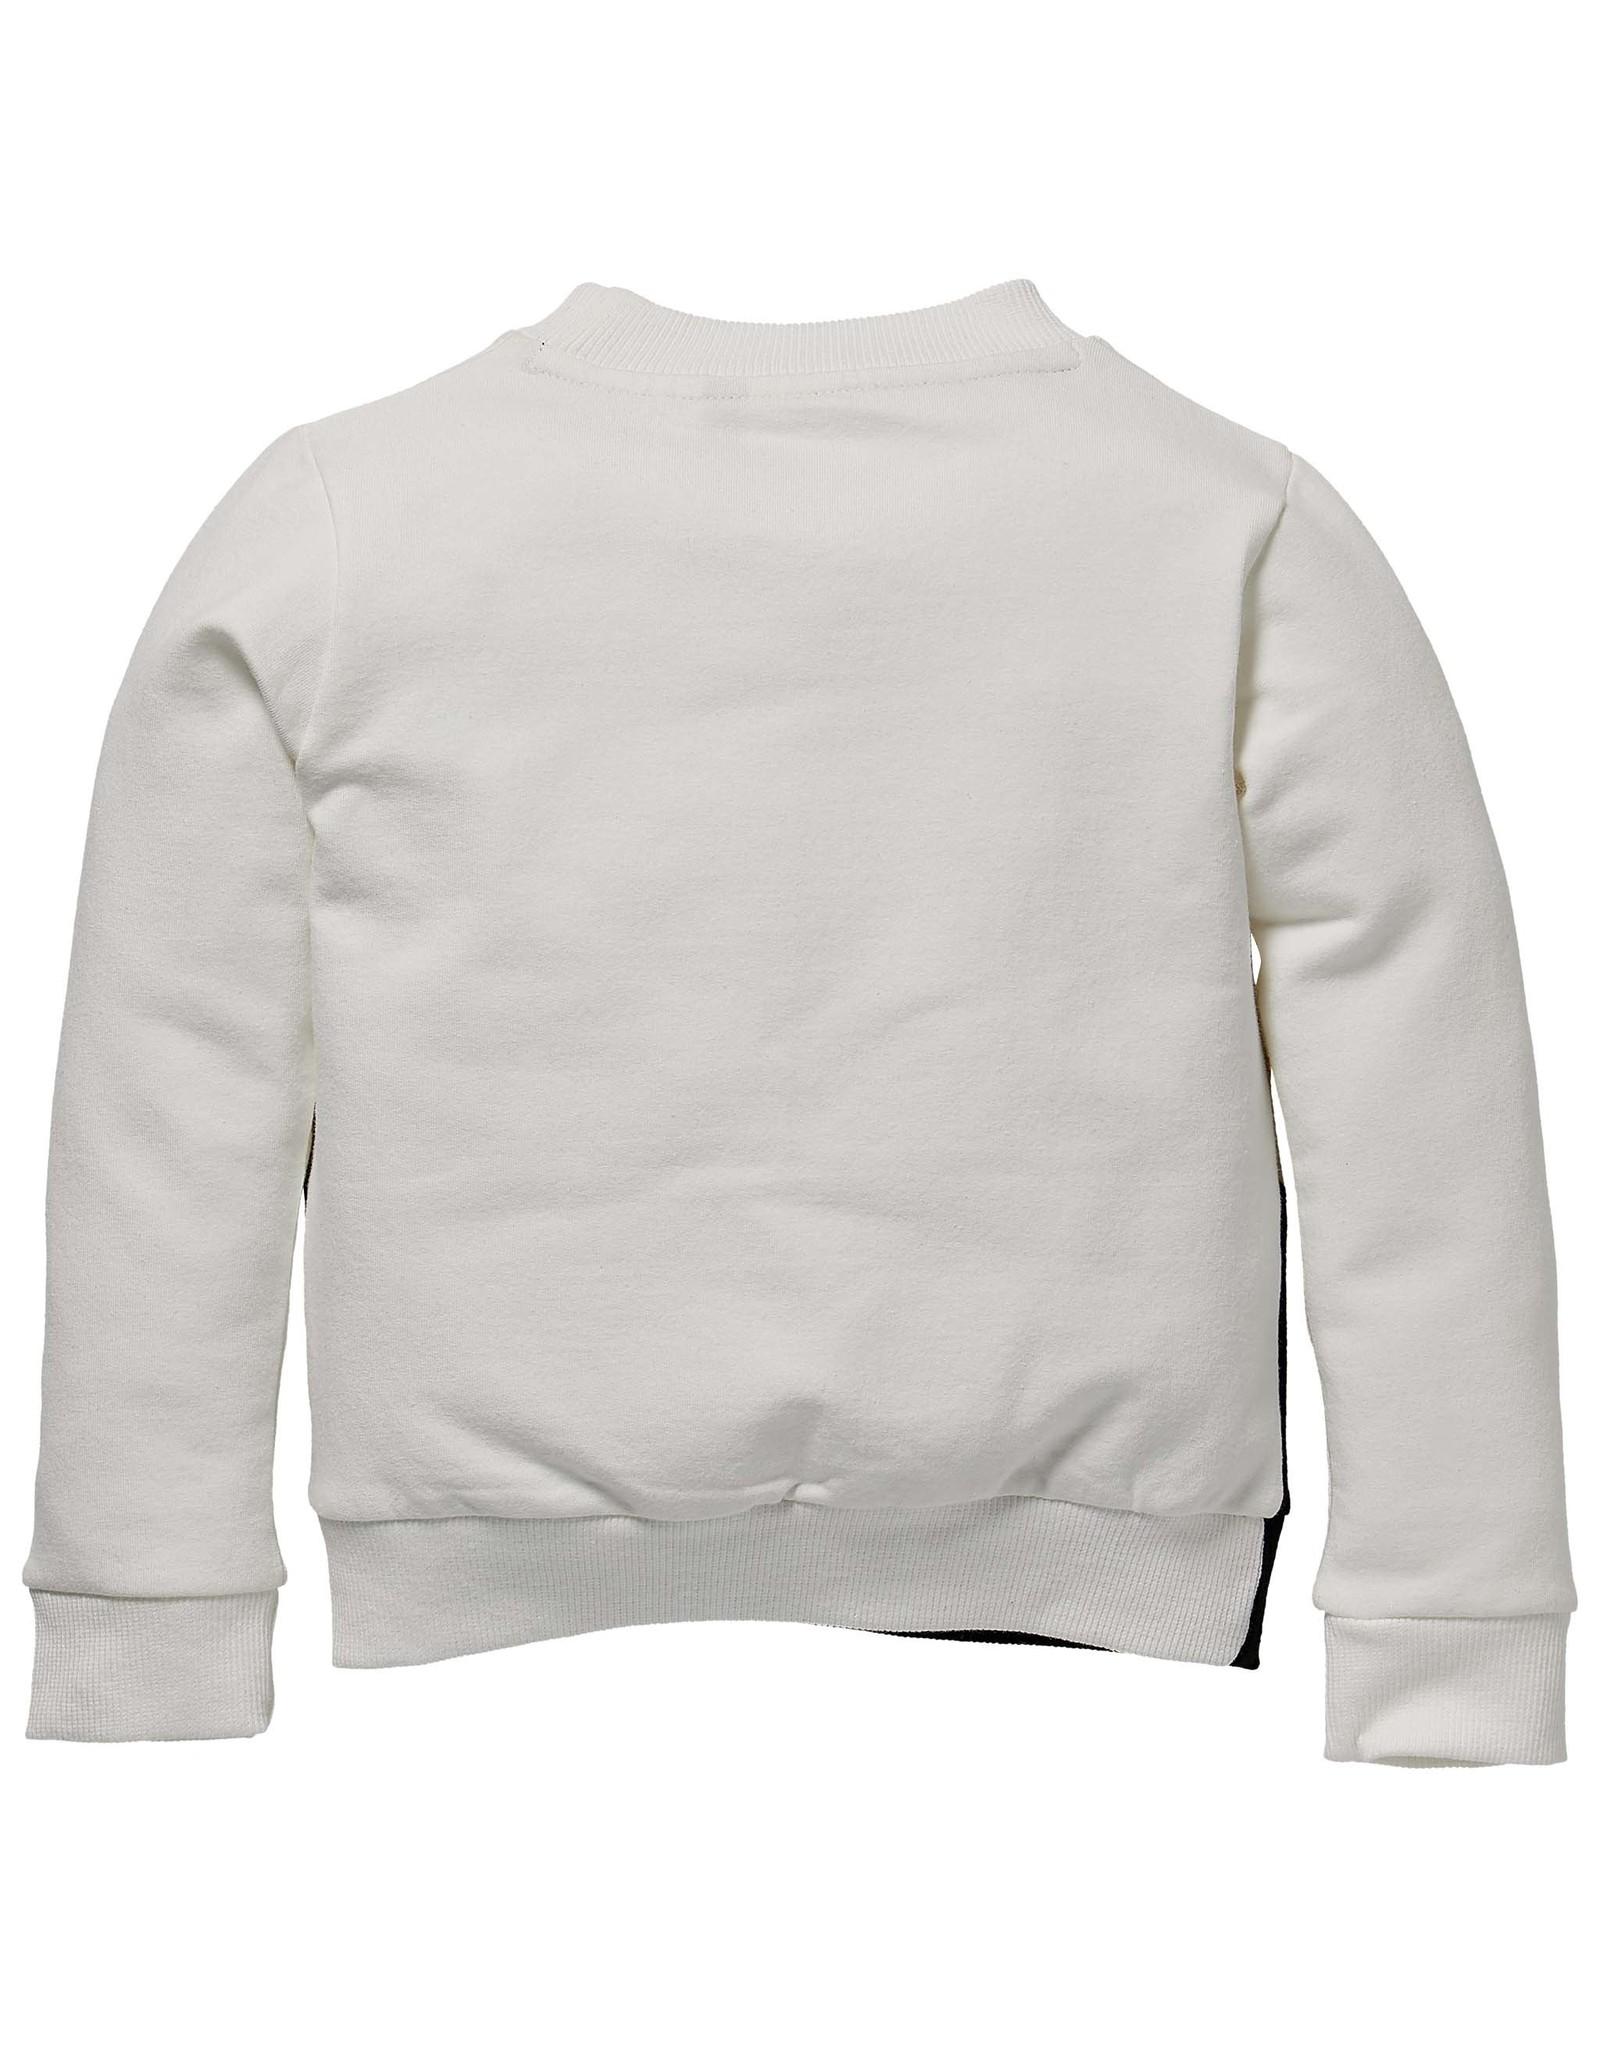 LEVV Levv meisjes sweater Sharon Off White